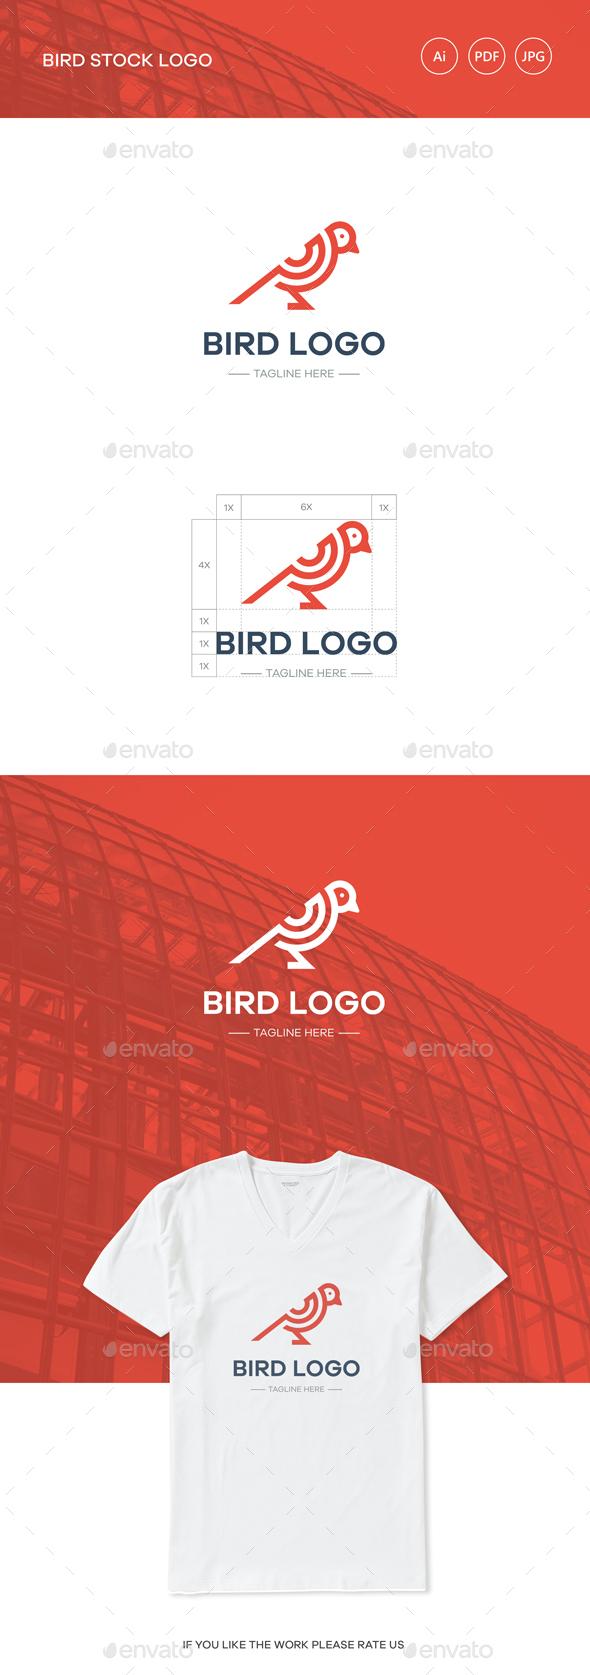 GraphicRiver Bird Stock Logo 20491936